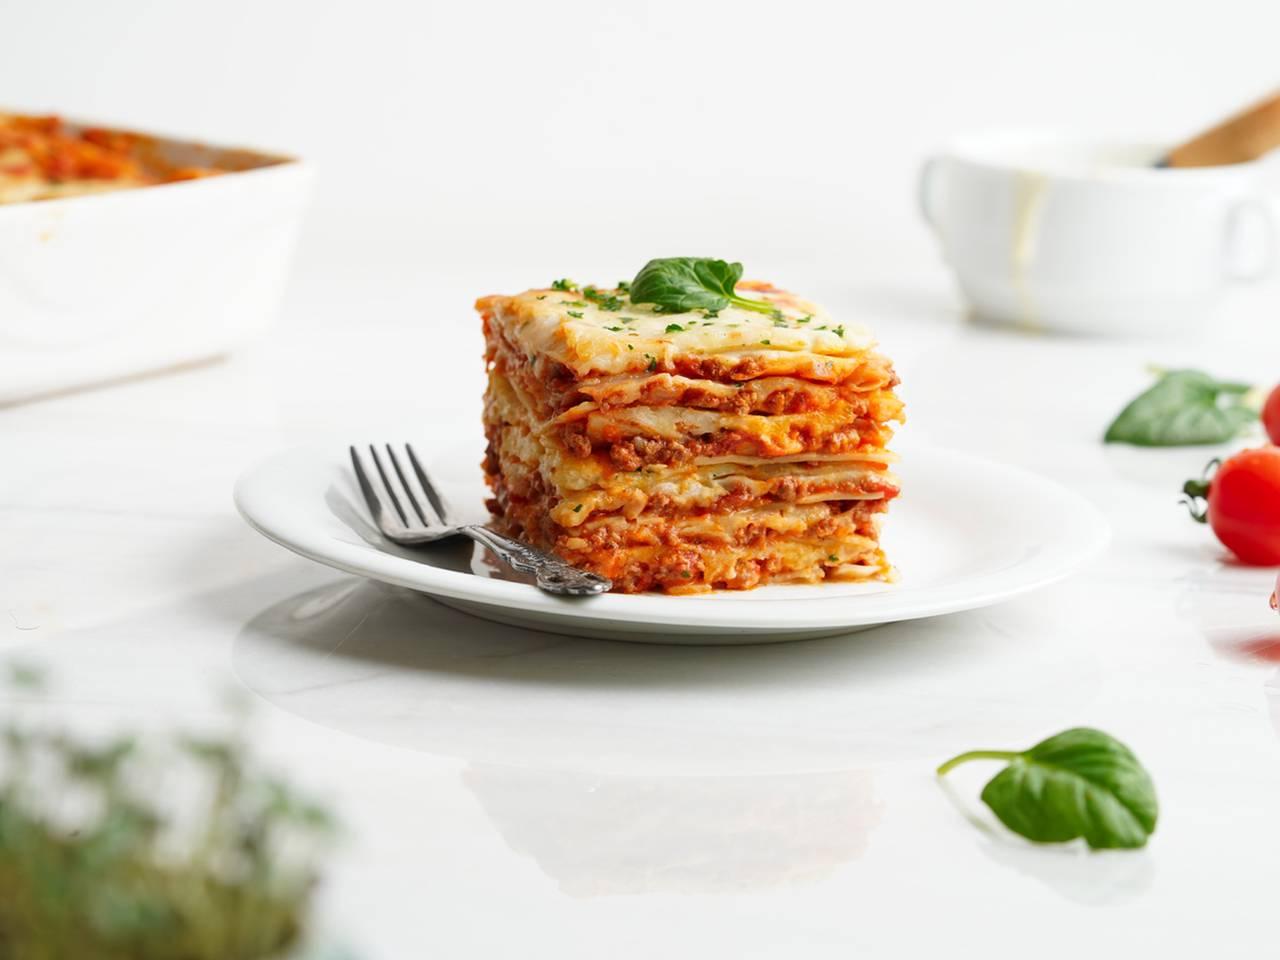 lasagna with spinach leaf garnish